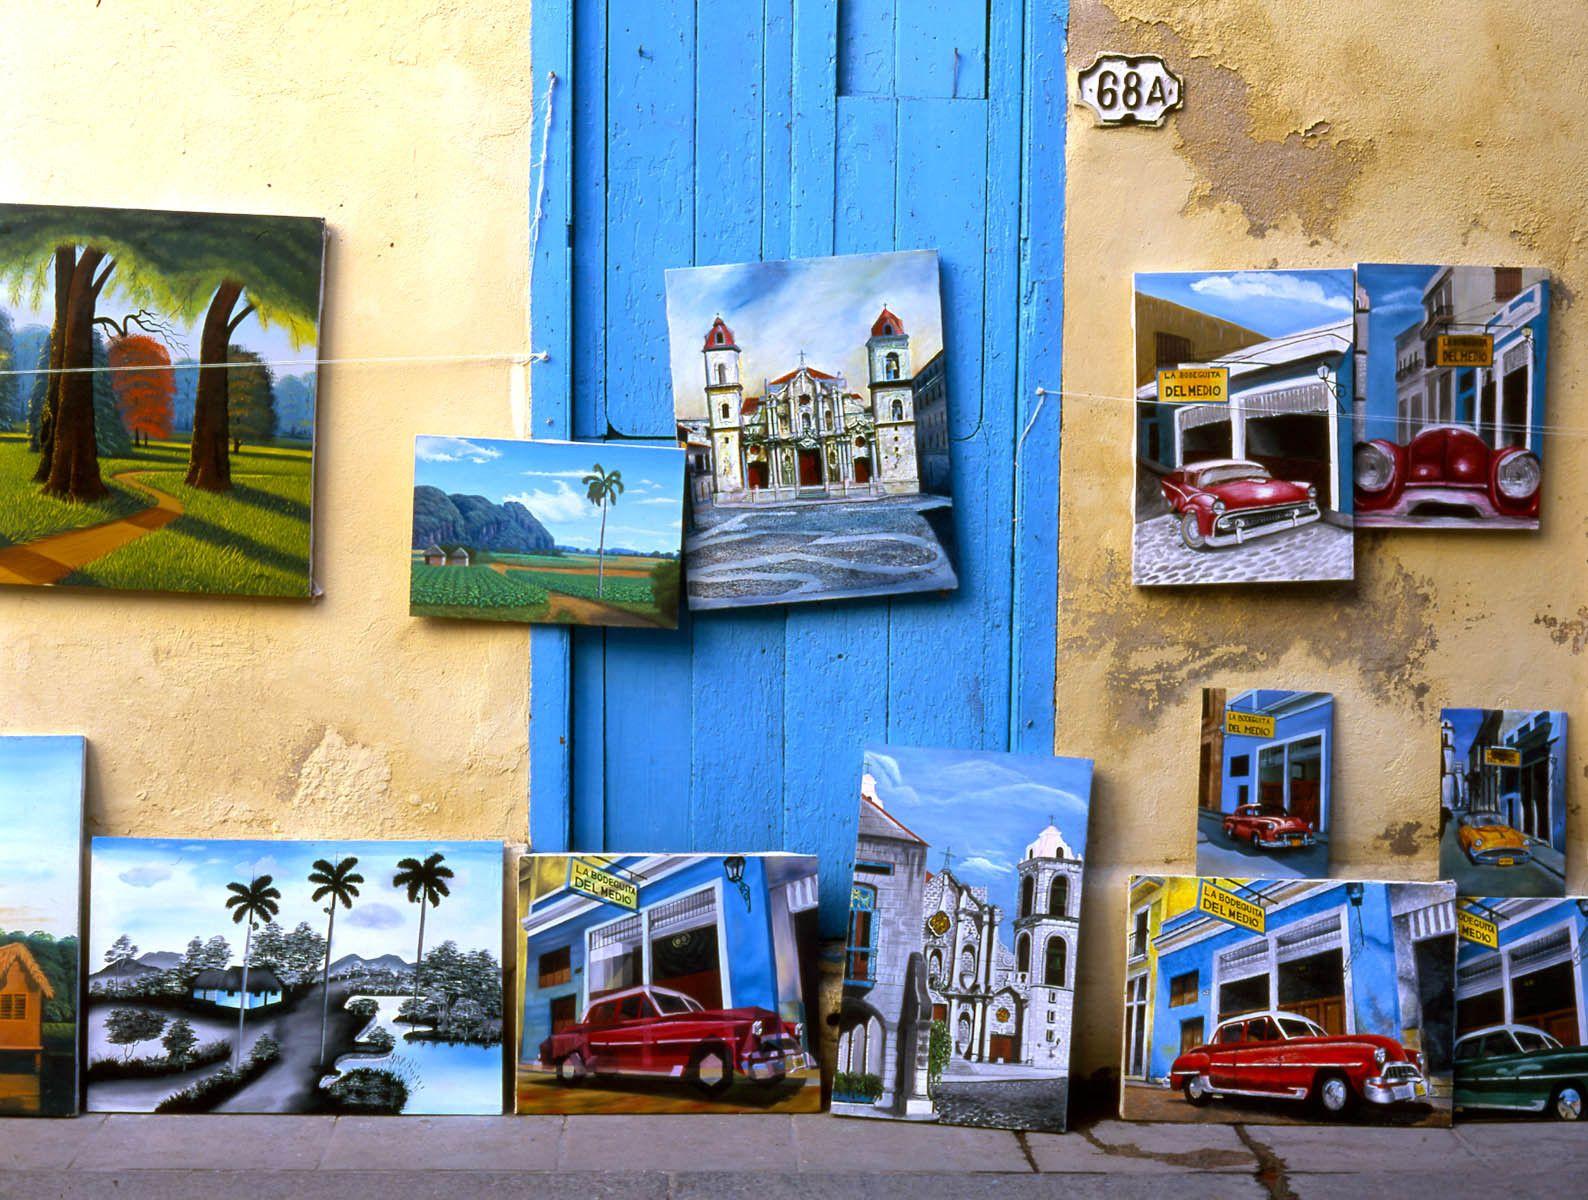 Artwork in Havana, Cuba